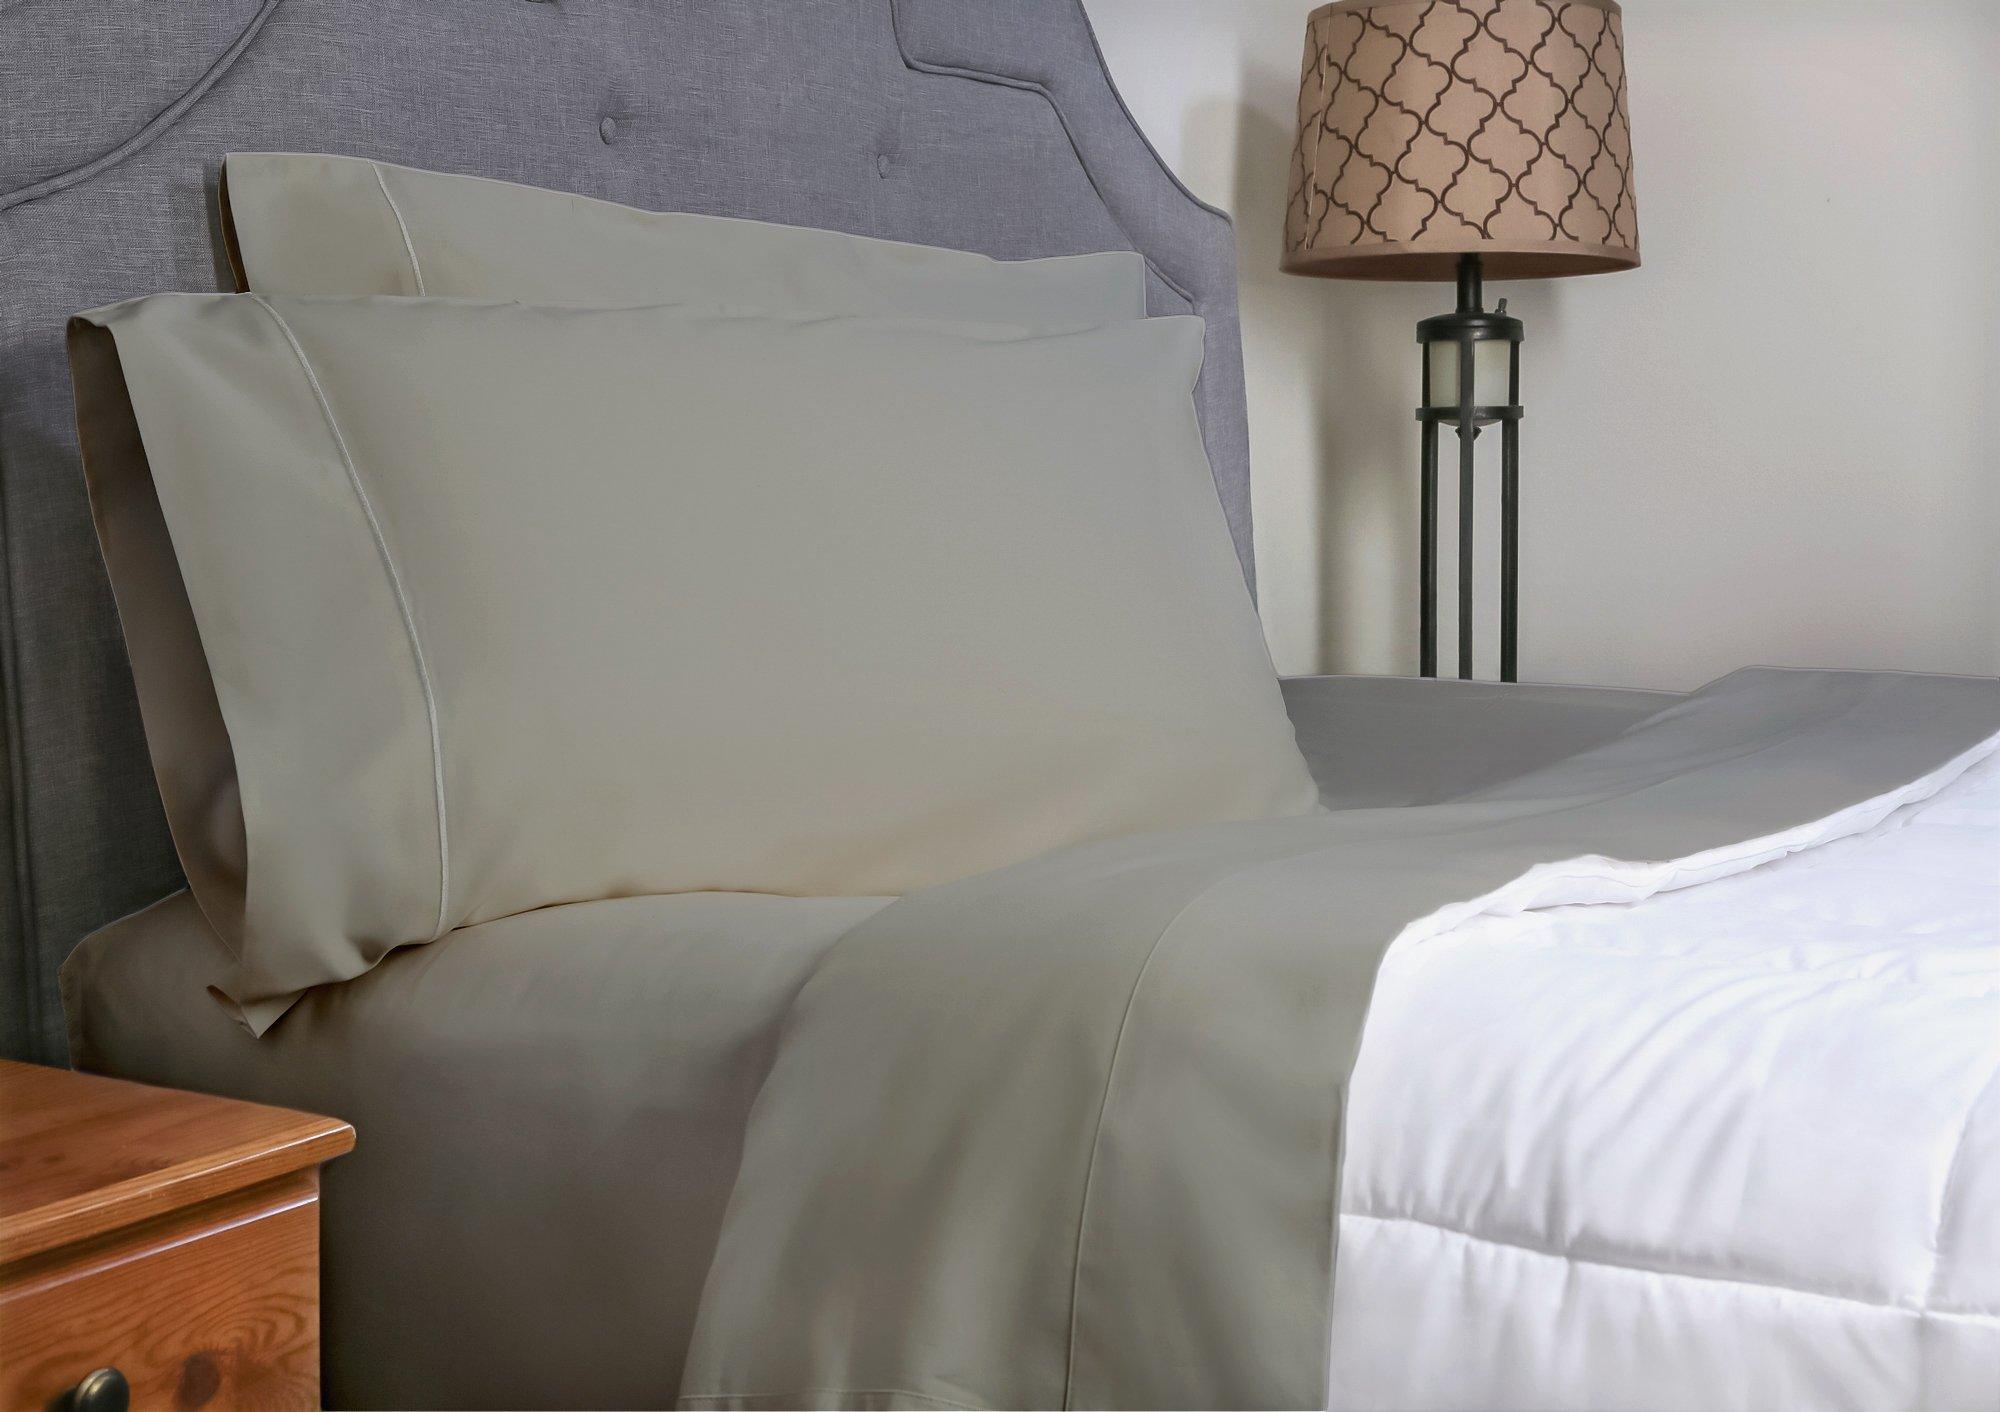 Whisper Organics Bed Sheets, Organic 100% Cotton Sheet Set, 500 Thread Count, 4 Piece: Fitted Sheet, Flat Sheet + 2 Pillowcases (California King, Silver)